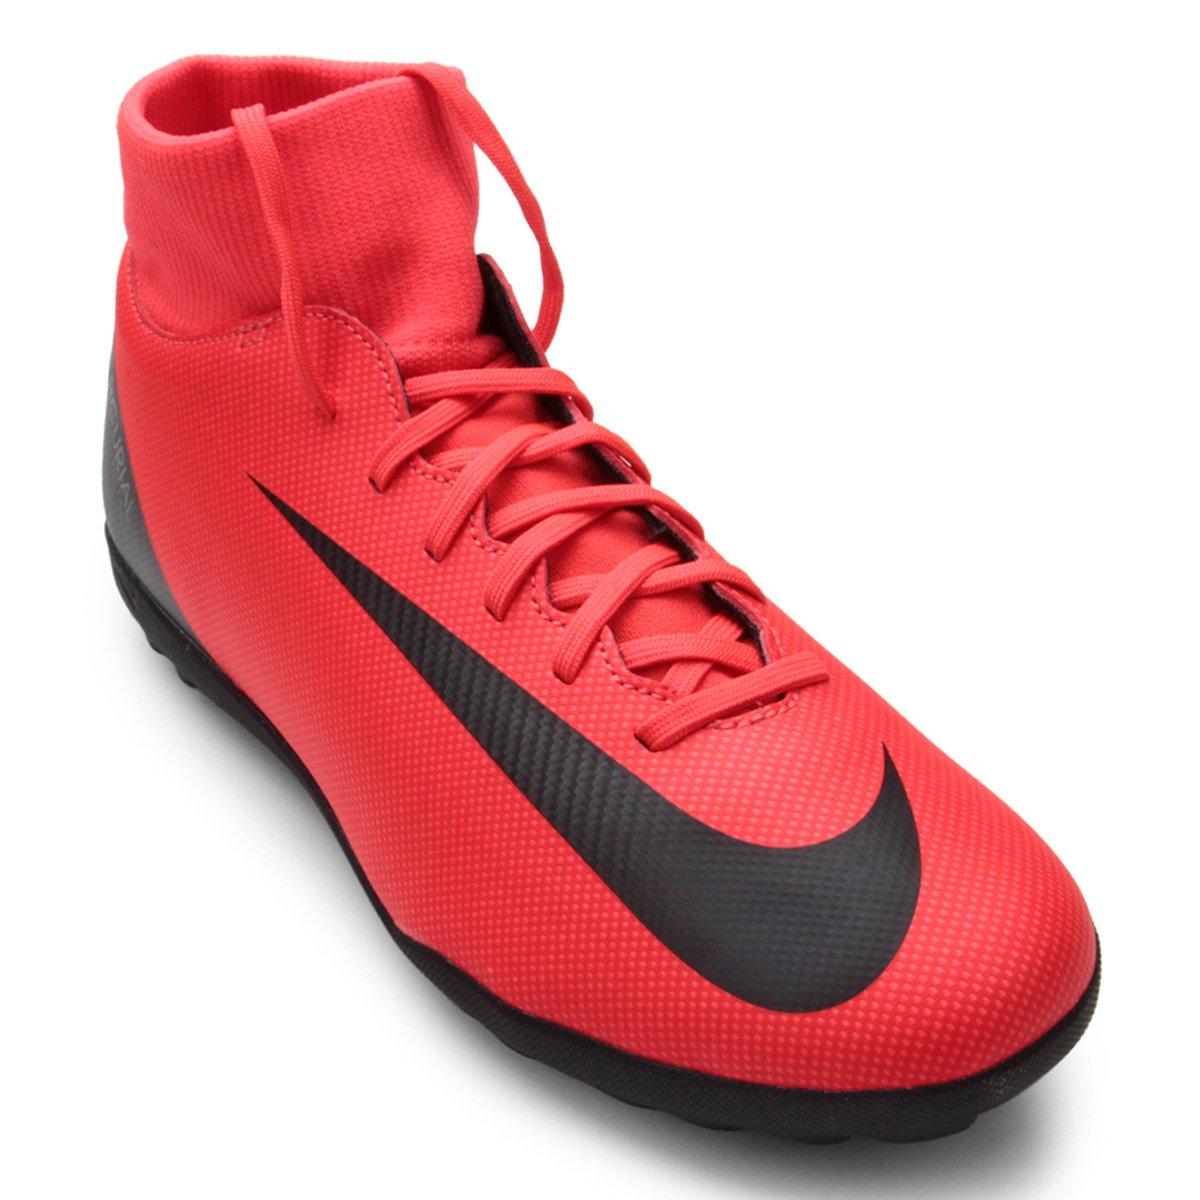 ada8338fe0f8d Chuteira Society Nike Superfly 6 Club CR7 TF - Compre Agora   Shop Timão